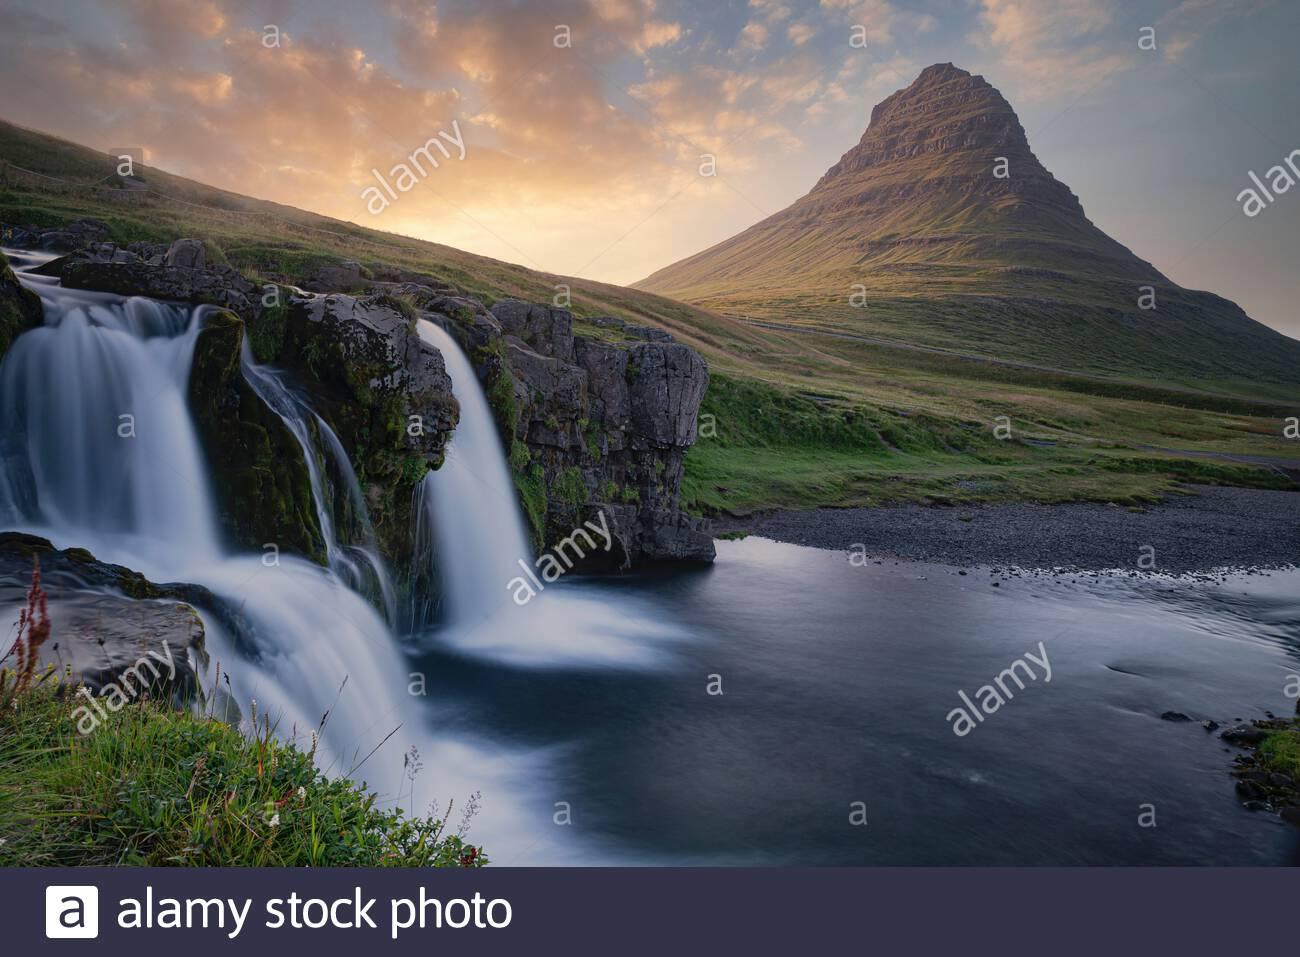 Iceland : Kirkjufell mountain and Kirkjufellfoss (falls) in Snæfellsnes peninsula, near the town of Grundarfjörður Stock Photo